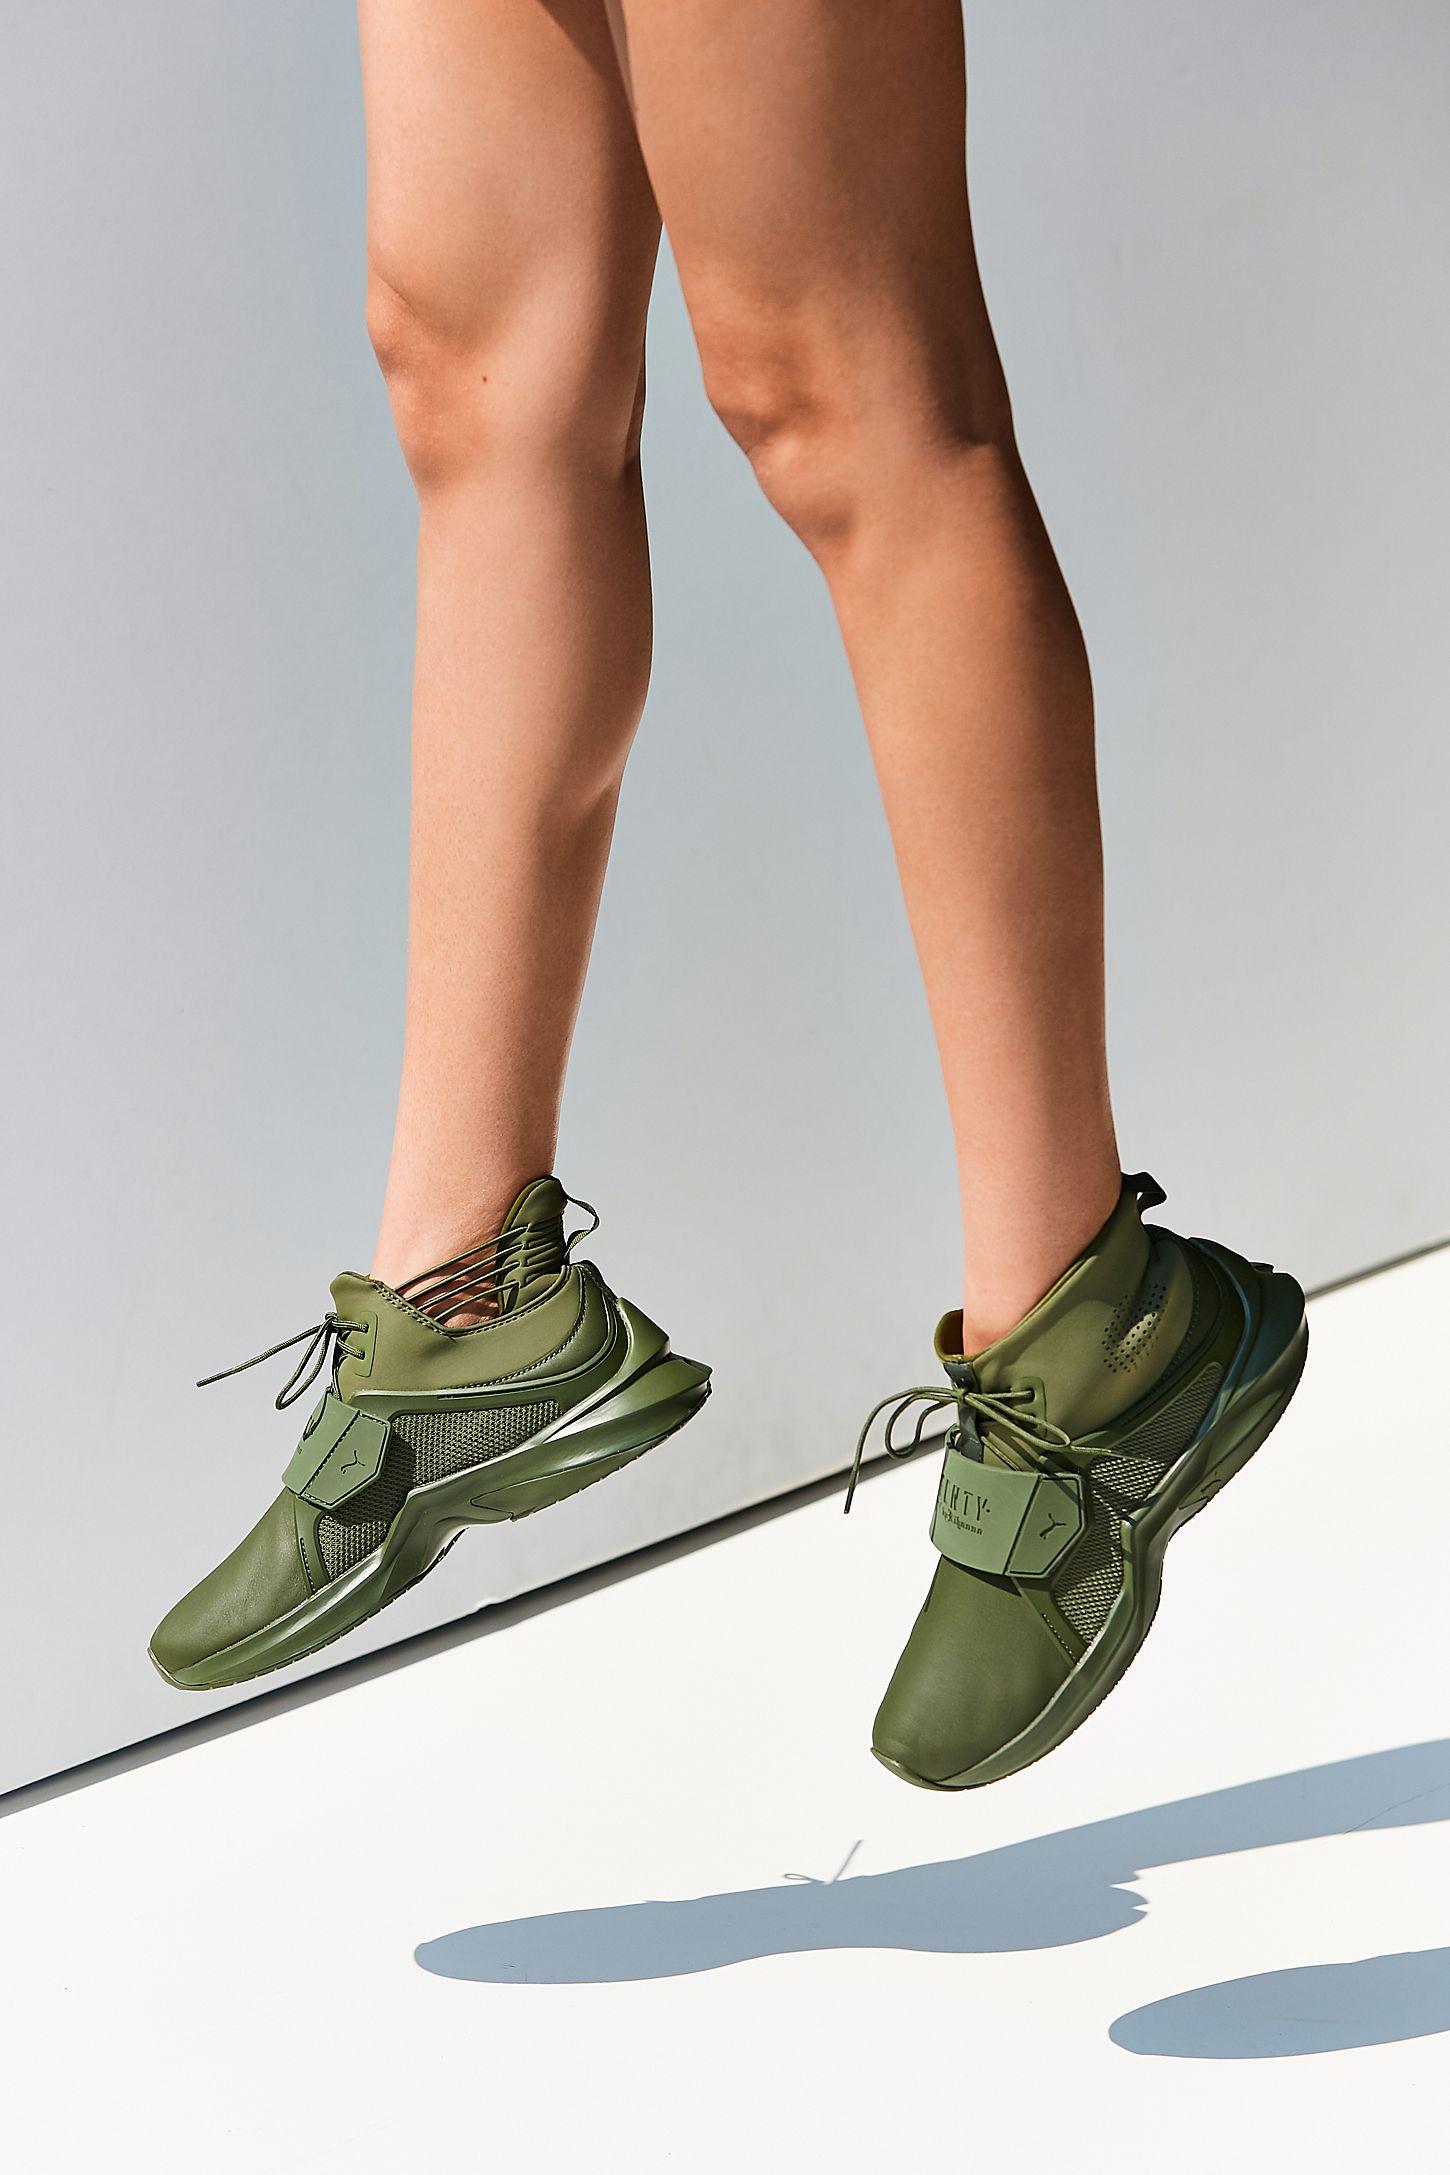 new product c4303 774e6 Puma Fenty by Rihanna Trainer Hi Leather Sneaker